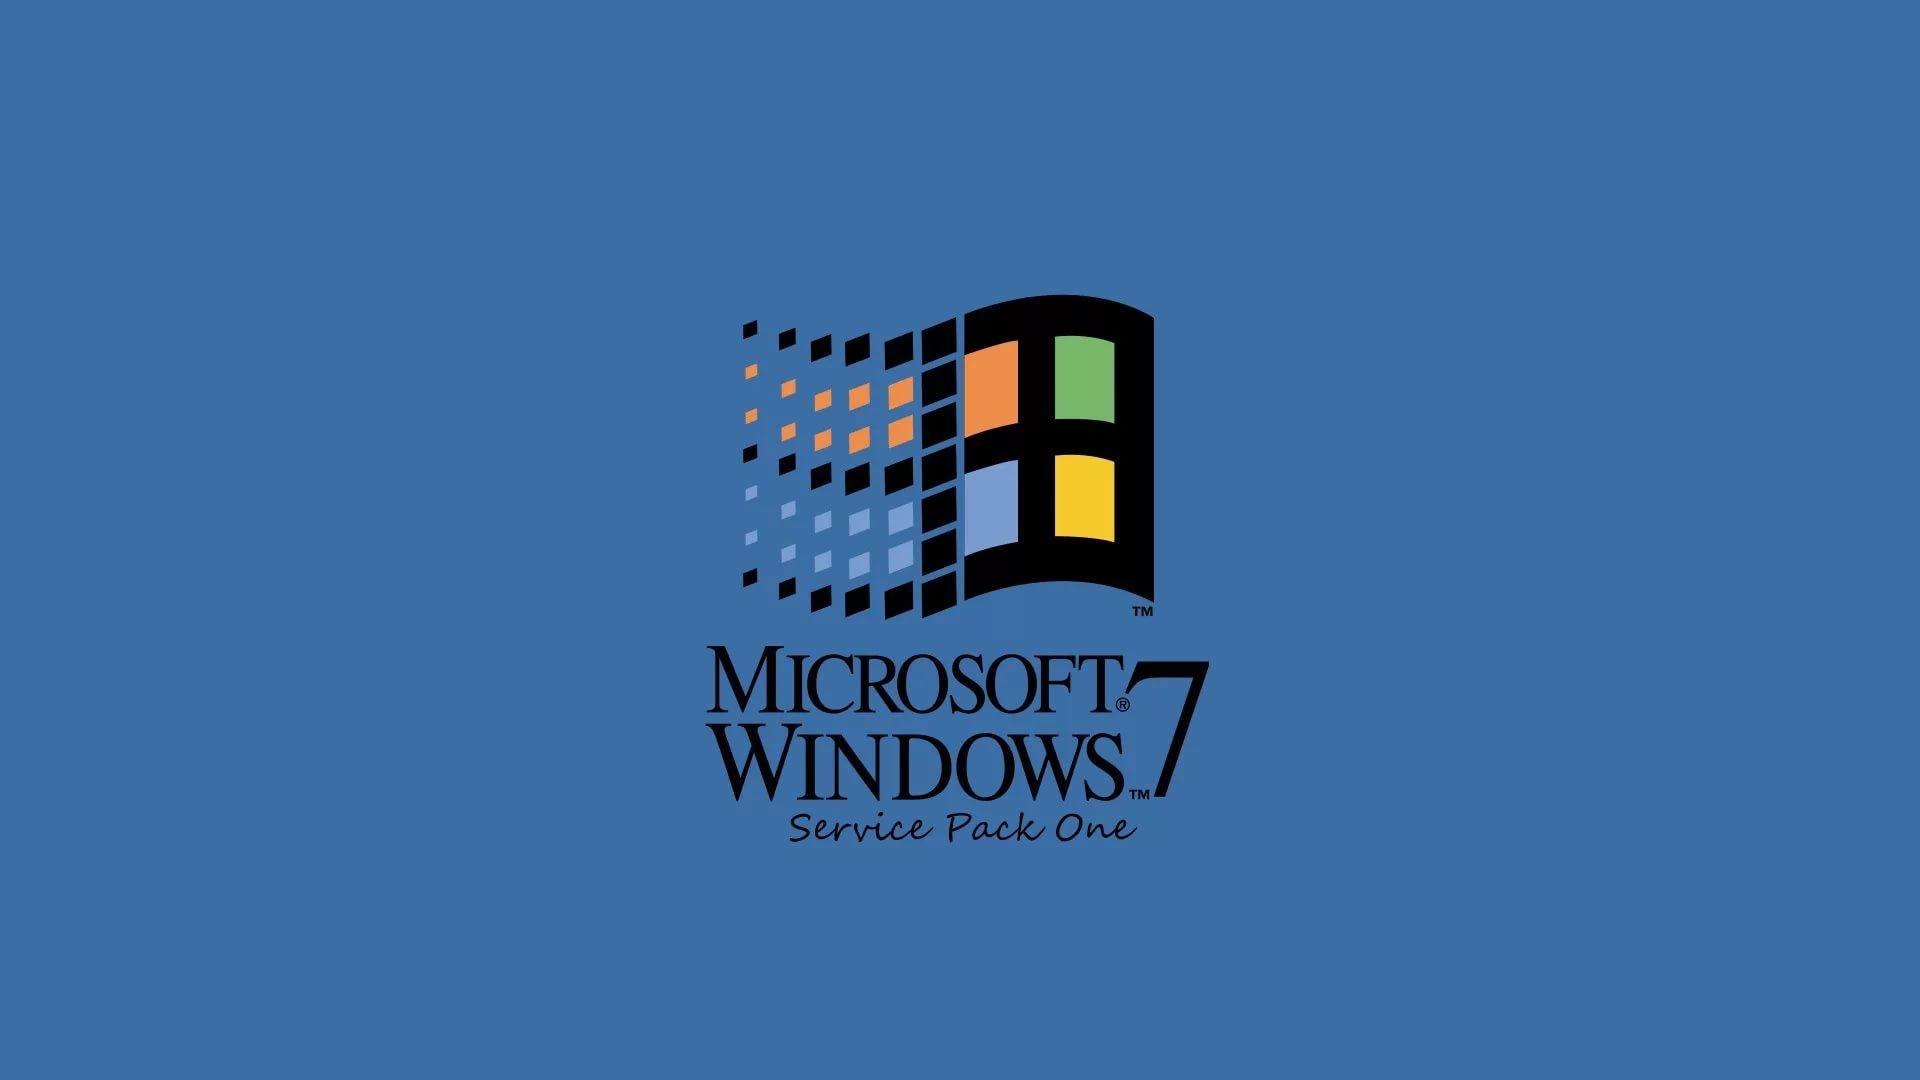 Windows Picture